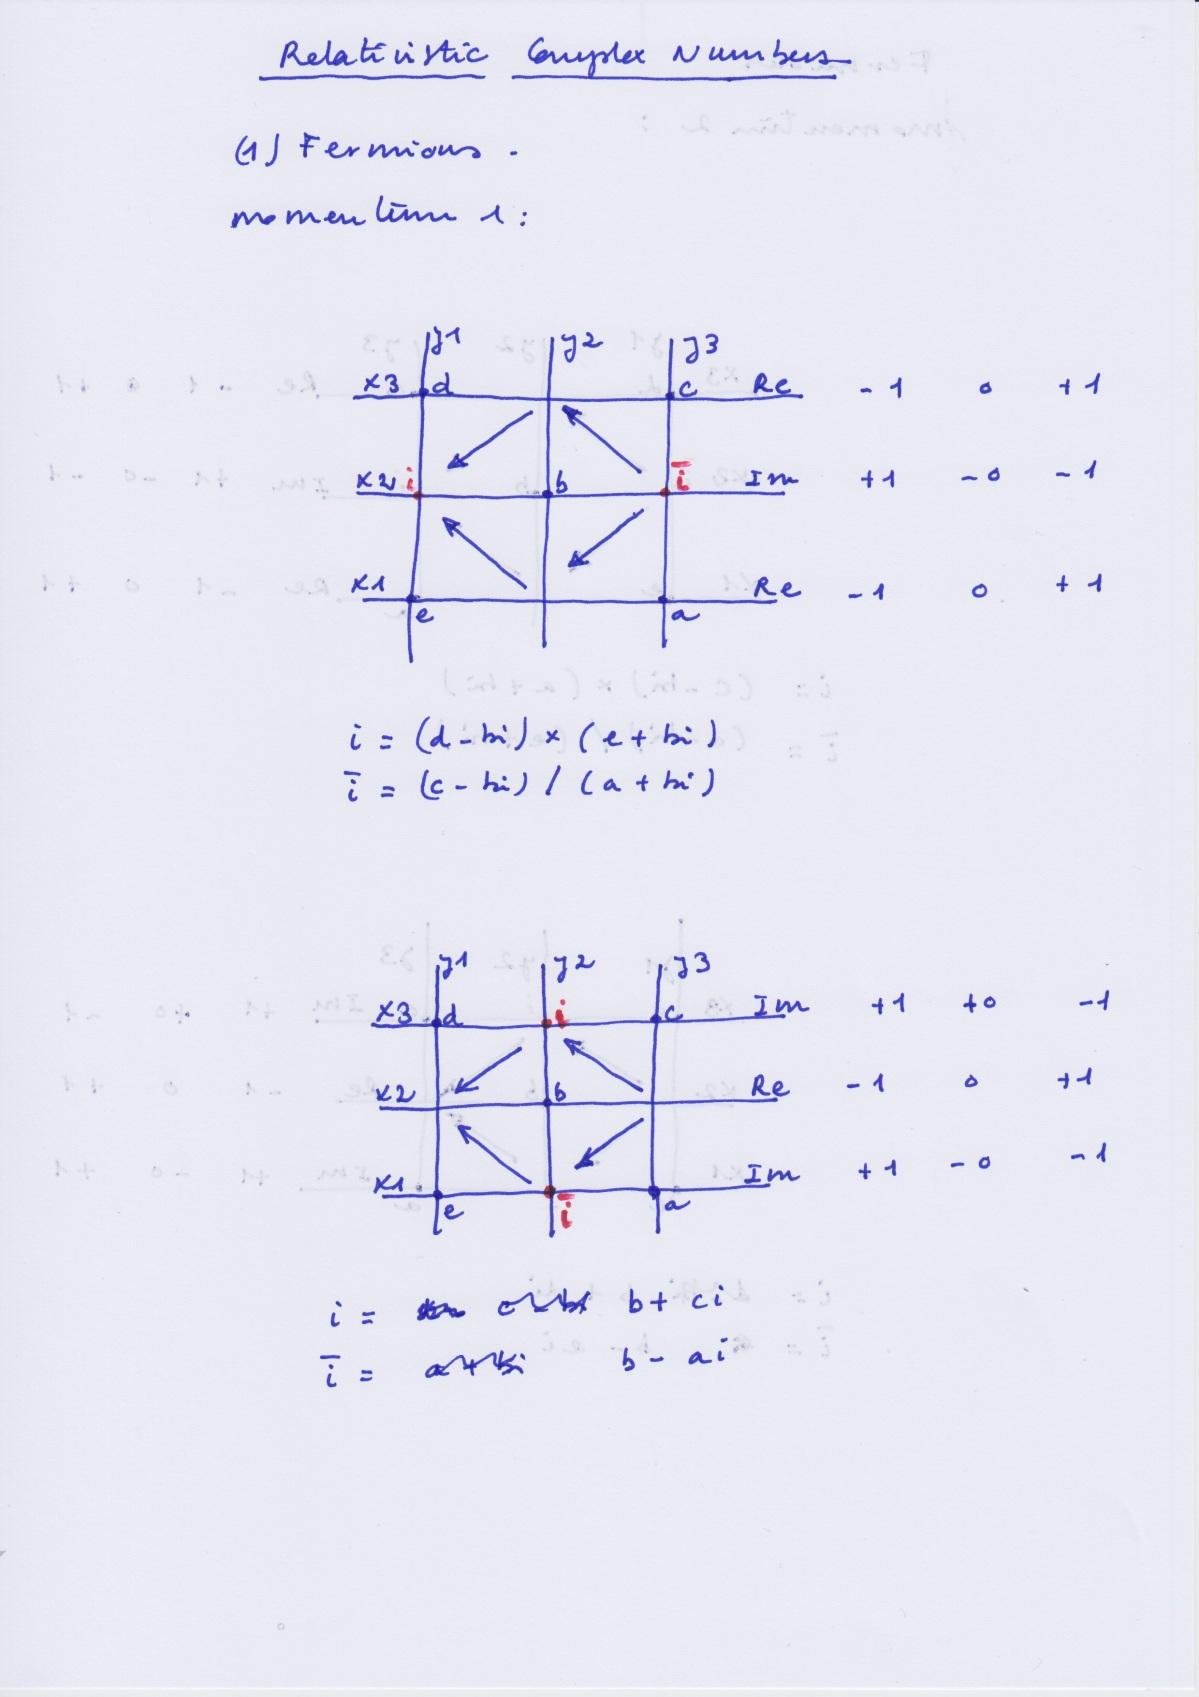 Relativistic_Complex_Numbers_FA